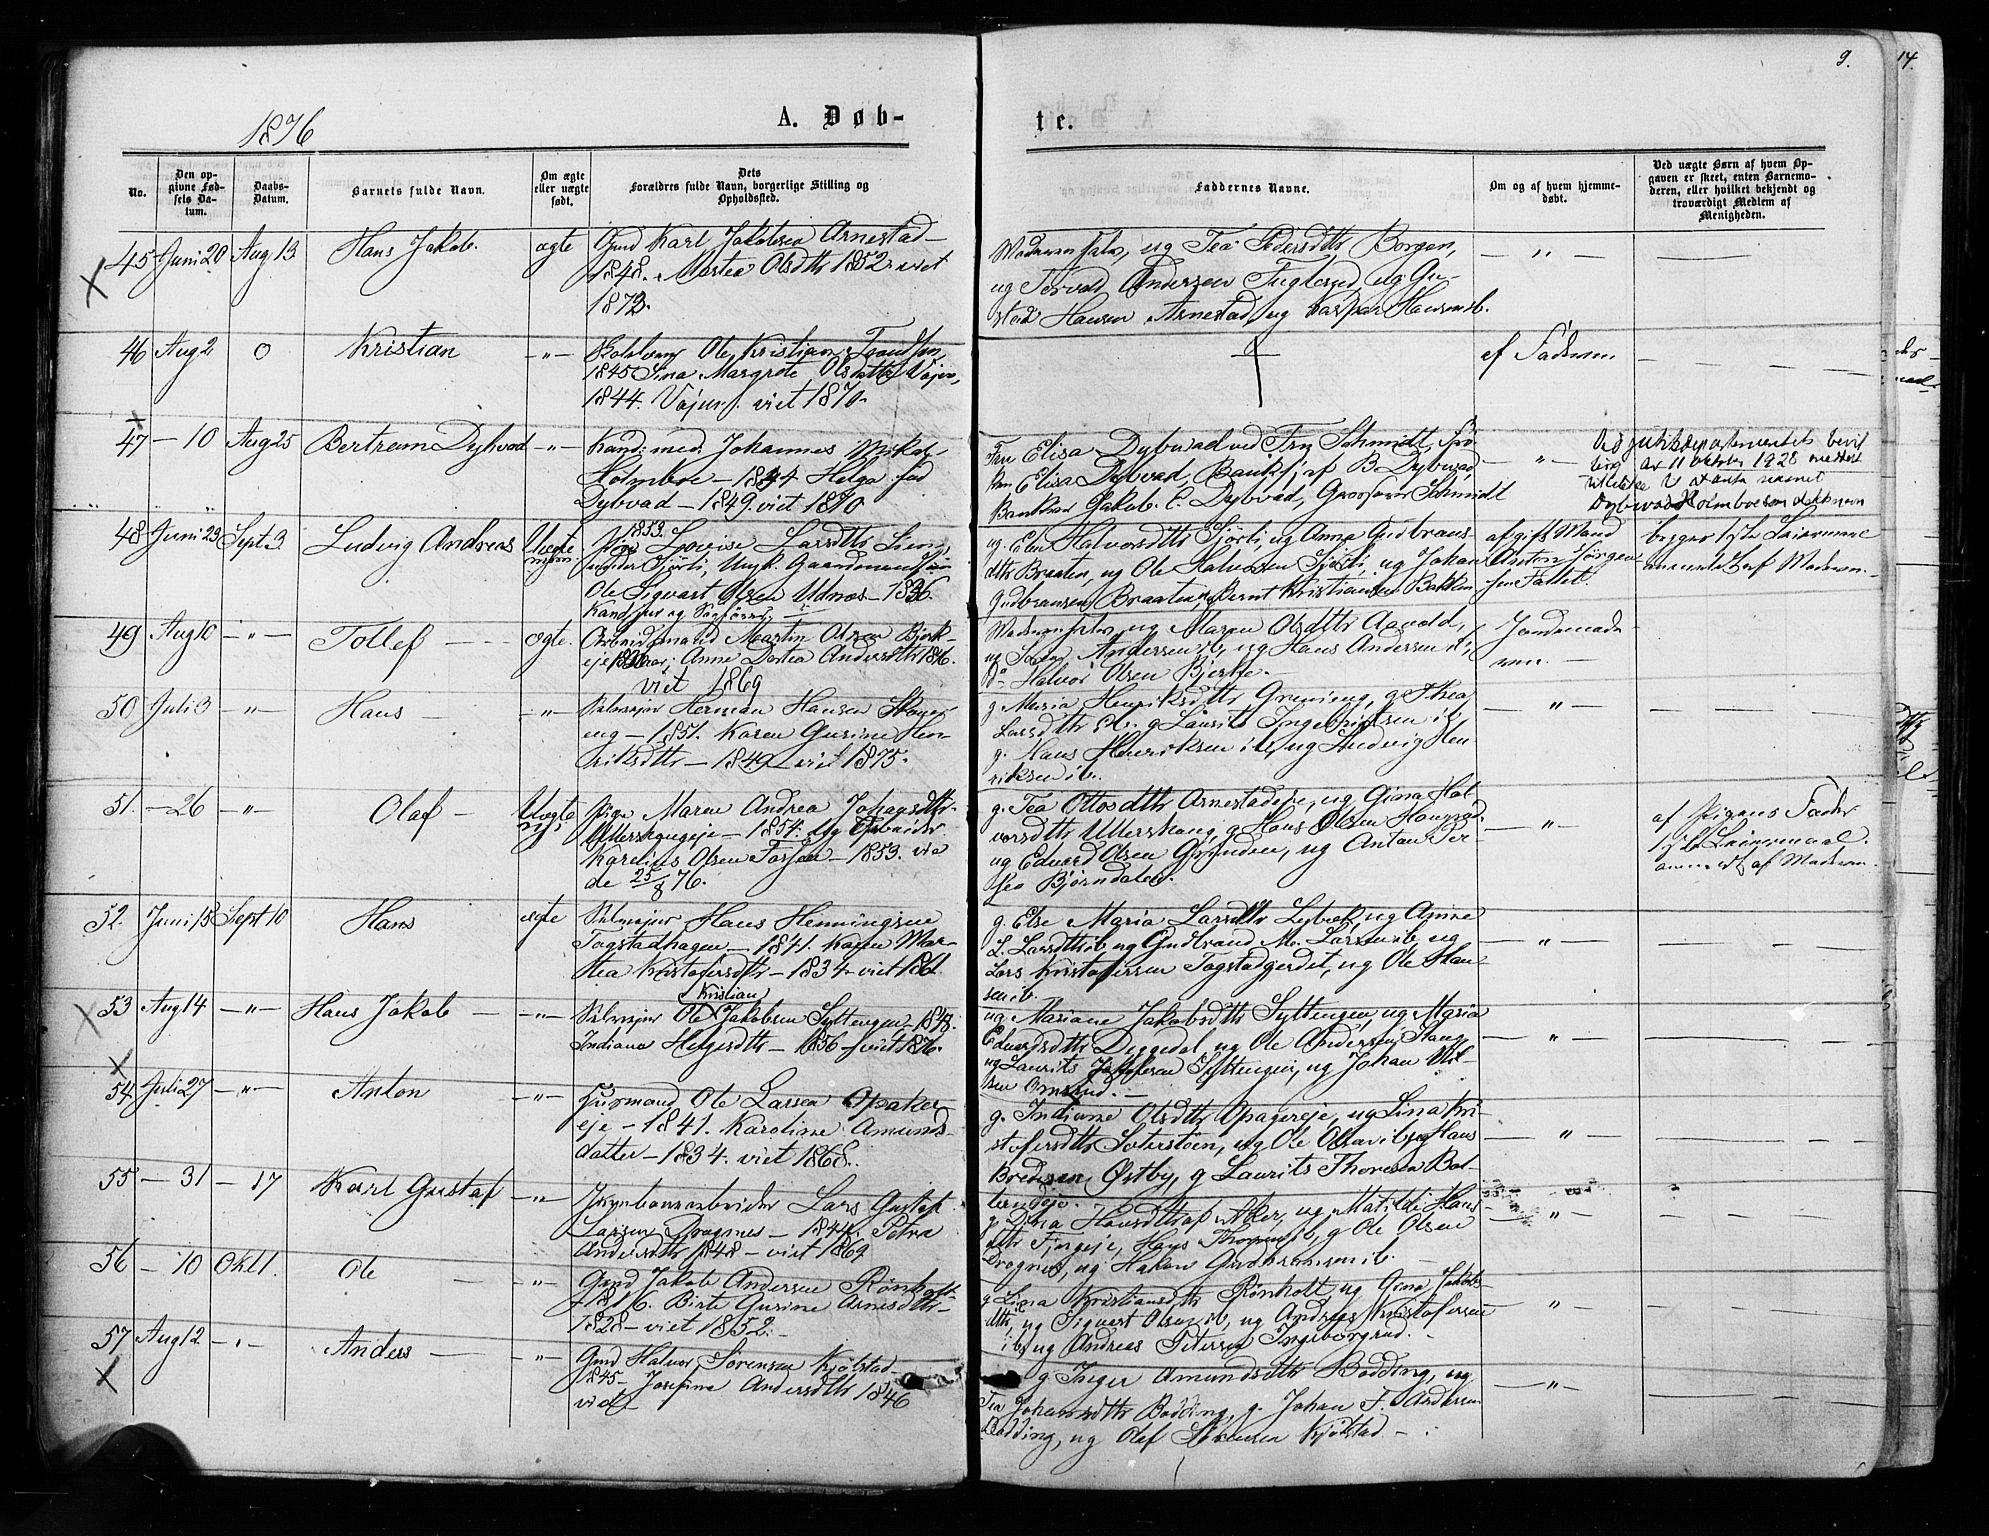 SAO, Nes prestekontor Kirkebøker, F/Fa/L0009: Parish register (official) no. I 9, 1875-1882, p. 9